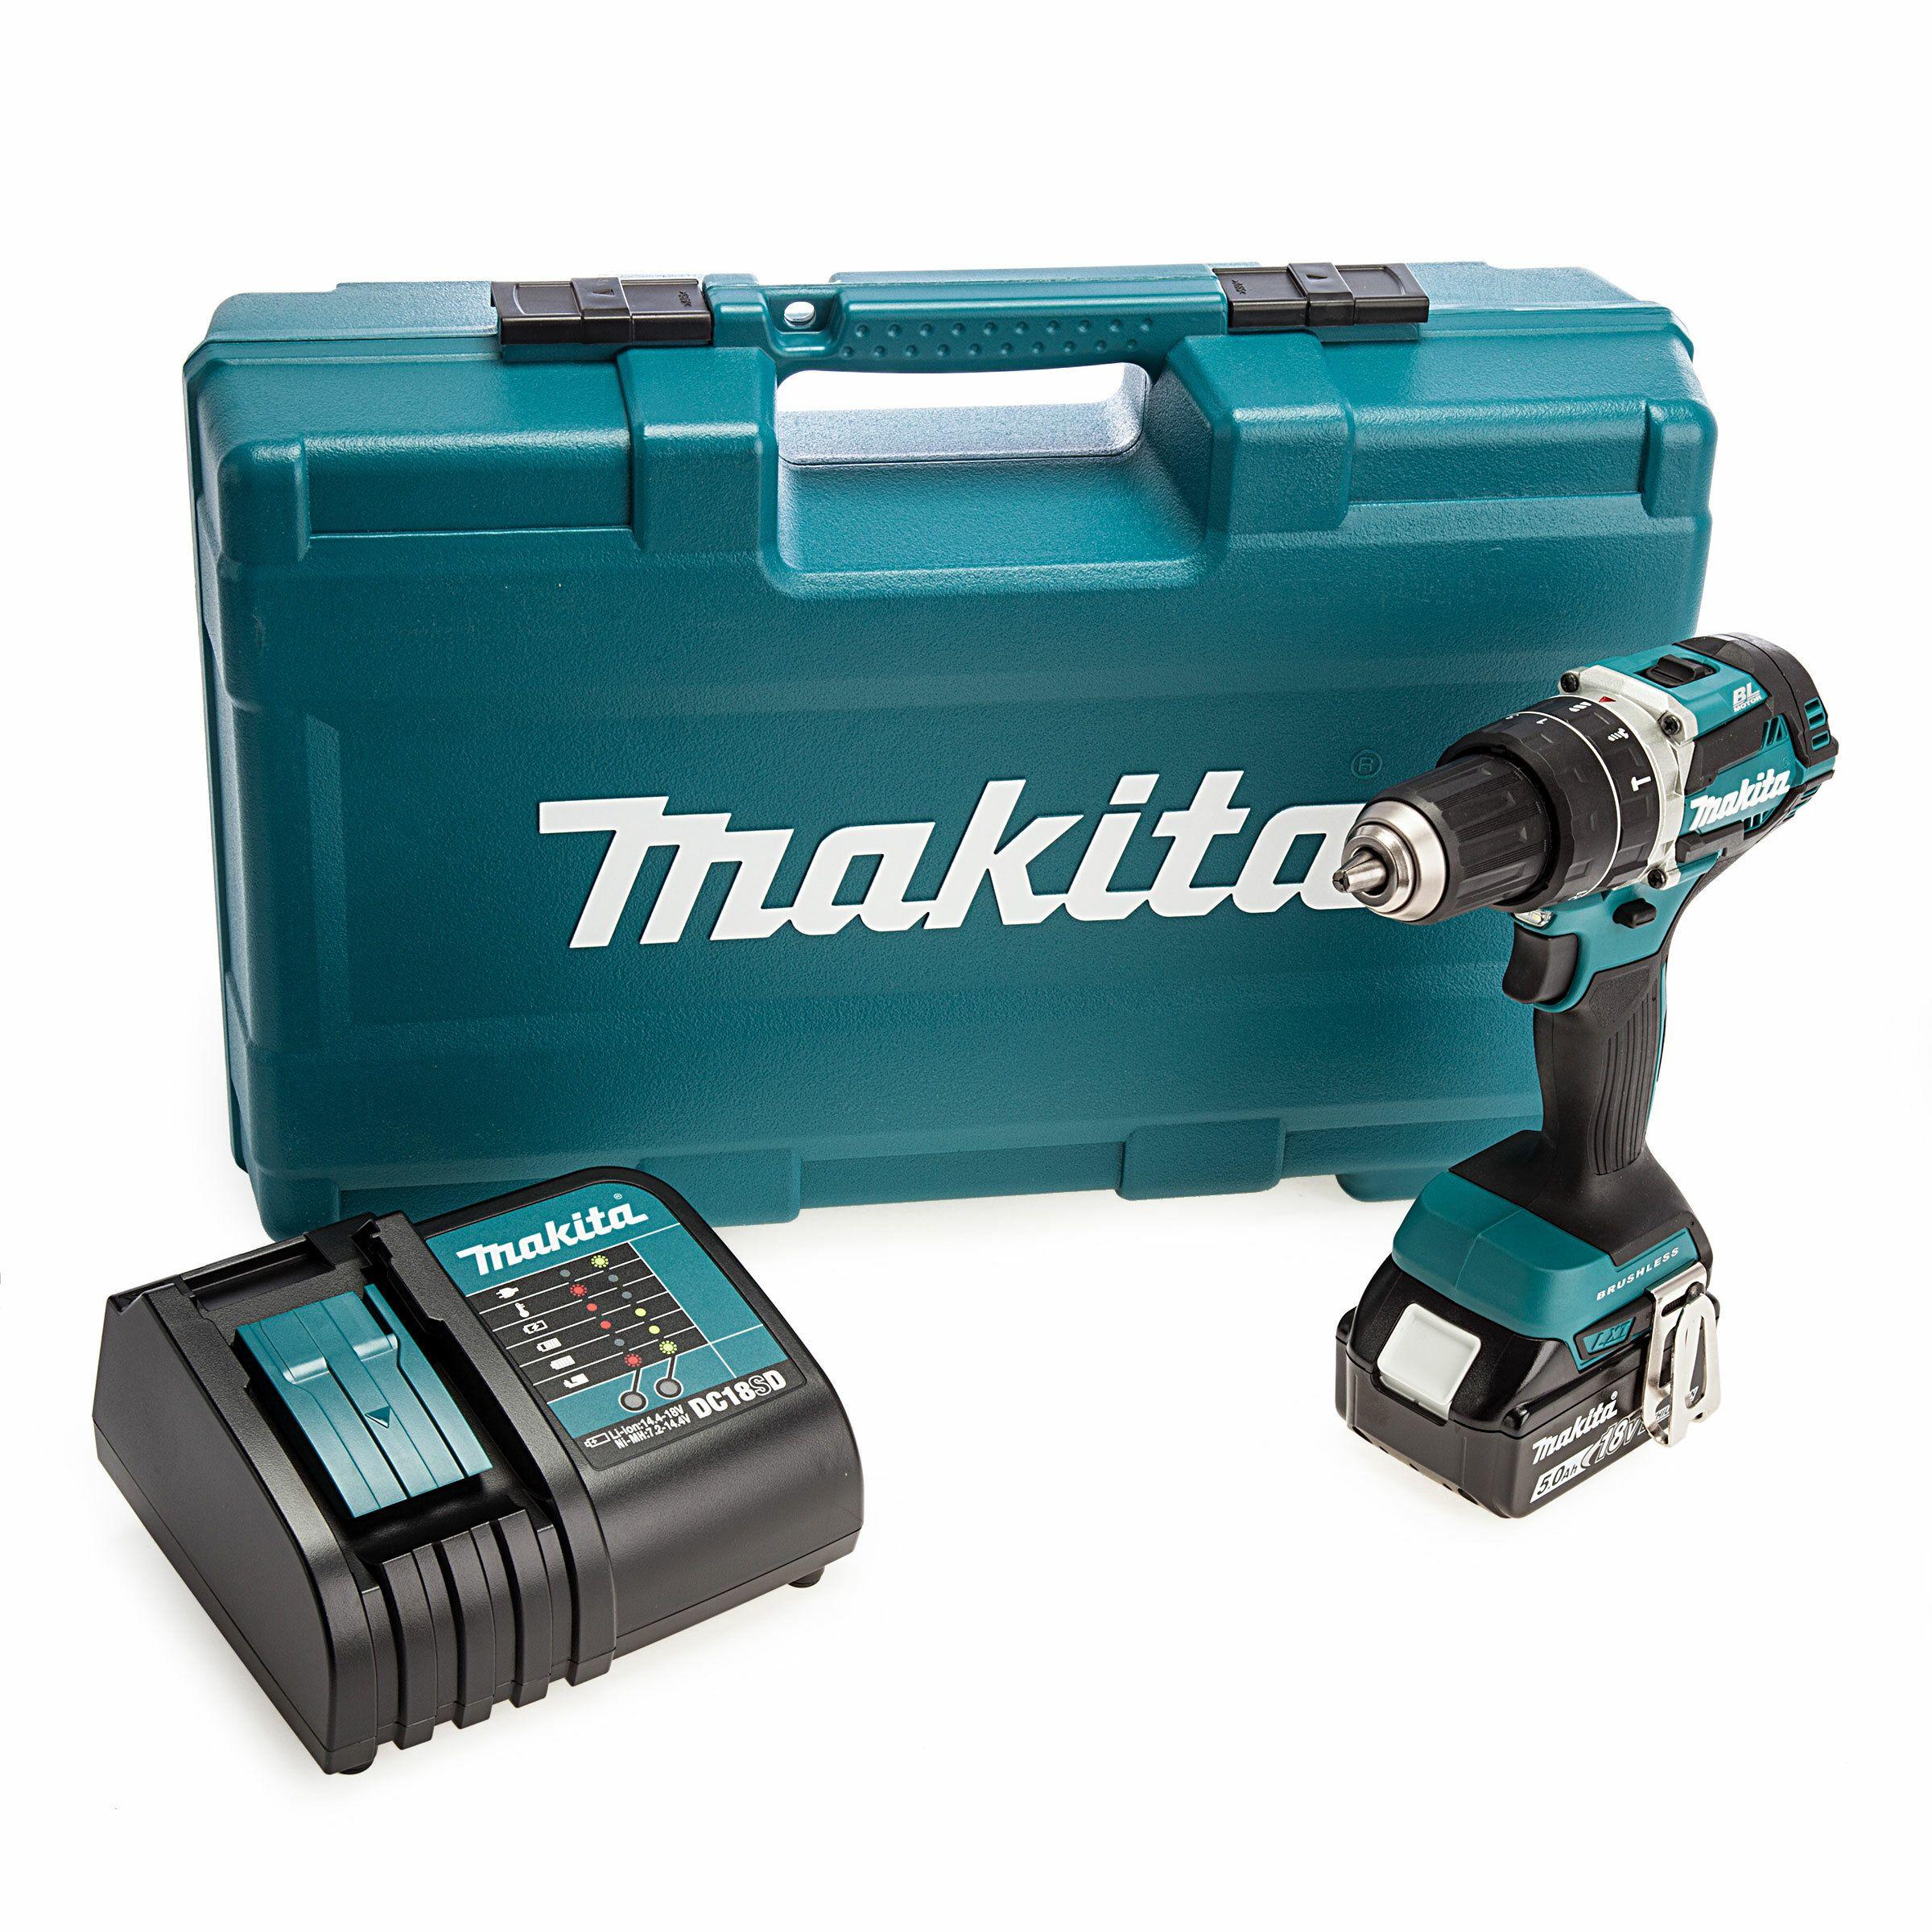 Makita DHP484STX5 18v Combi Drill Kit With 101 Piece Accessory Set